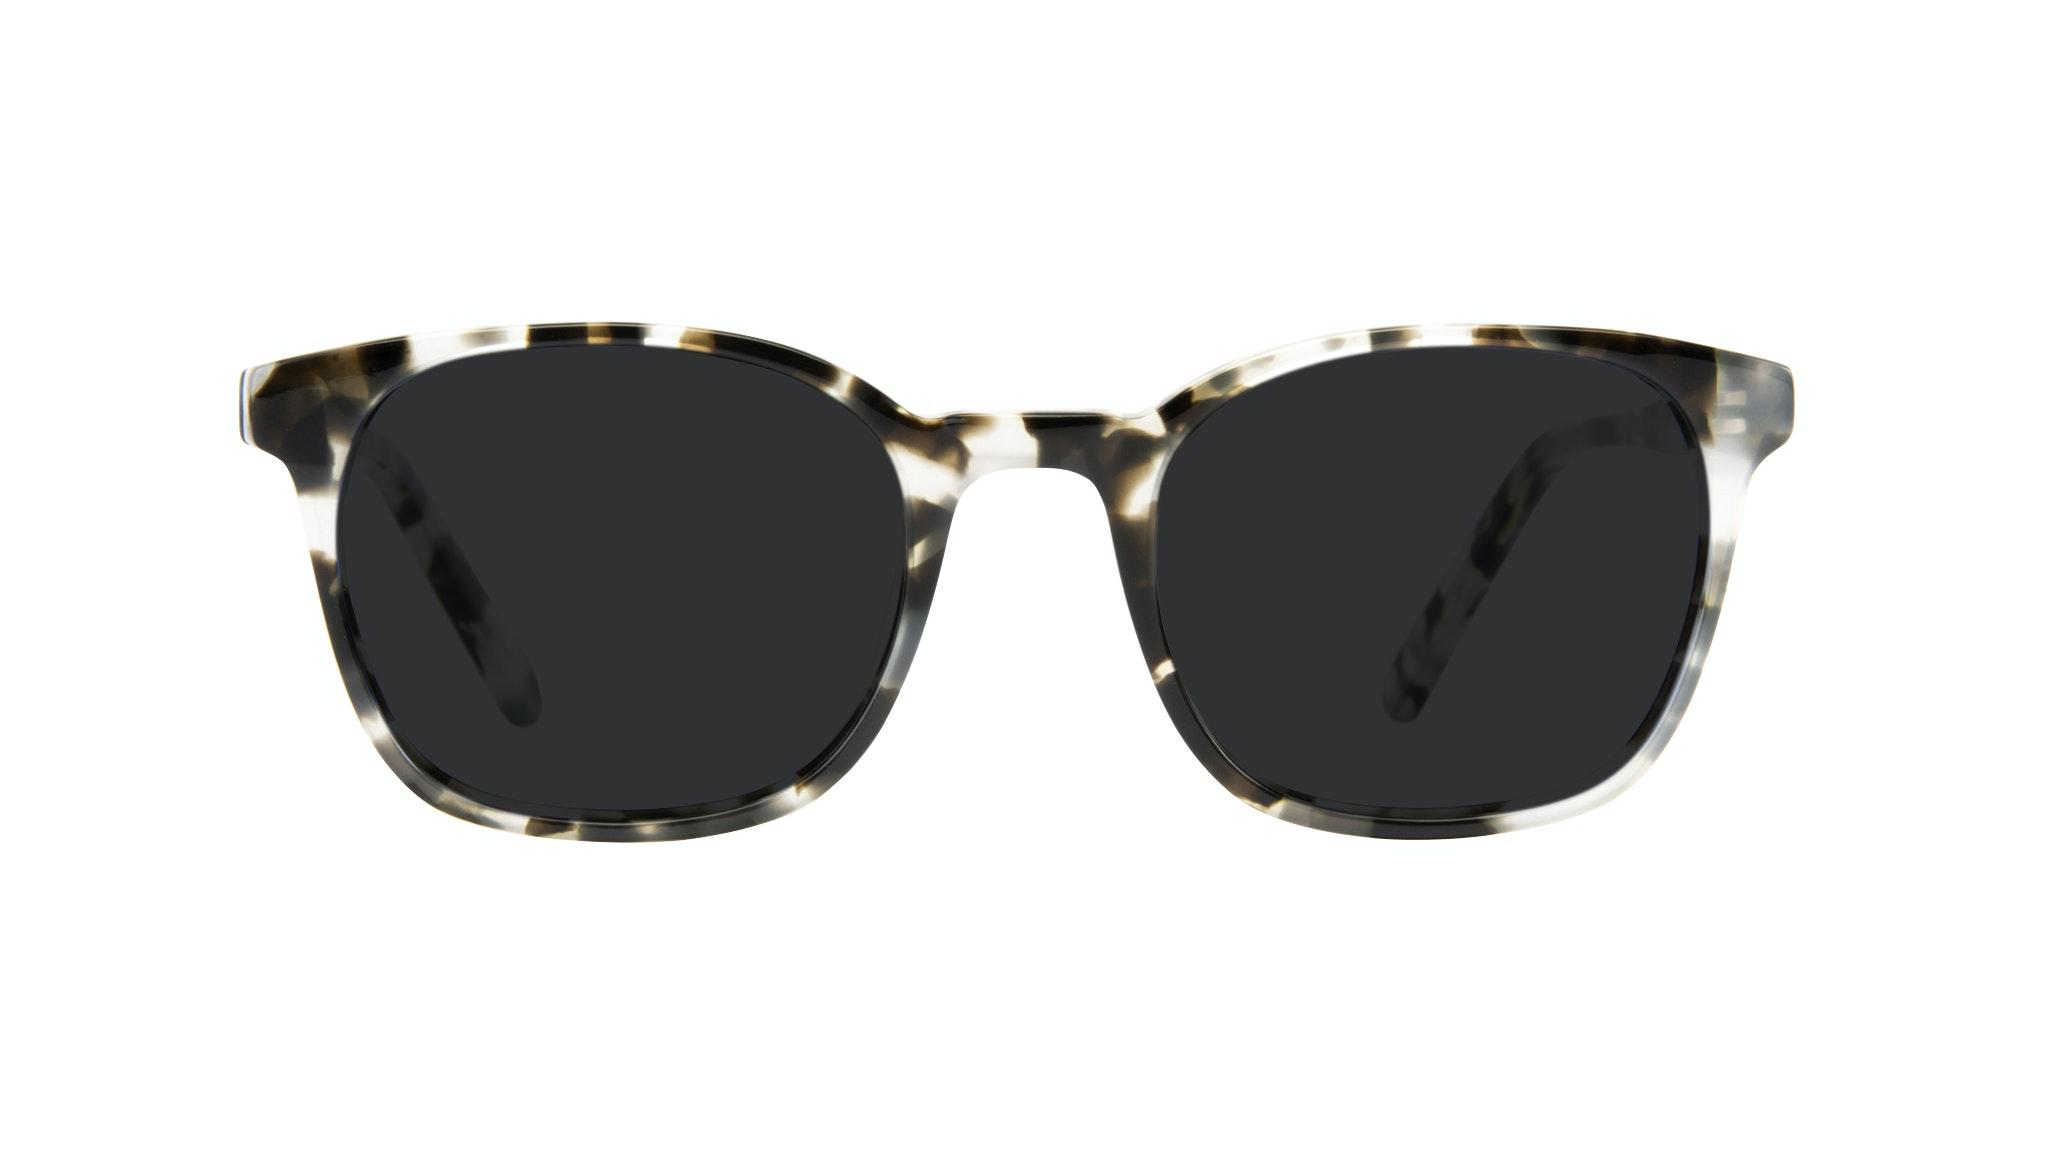 Affordable Fashion Glasses Rectangle Square Sunglasses Men Peak Camo Tort